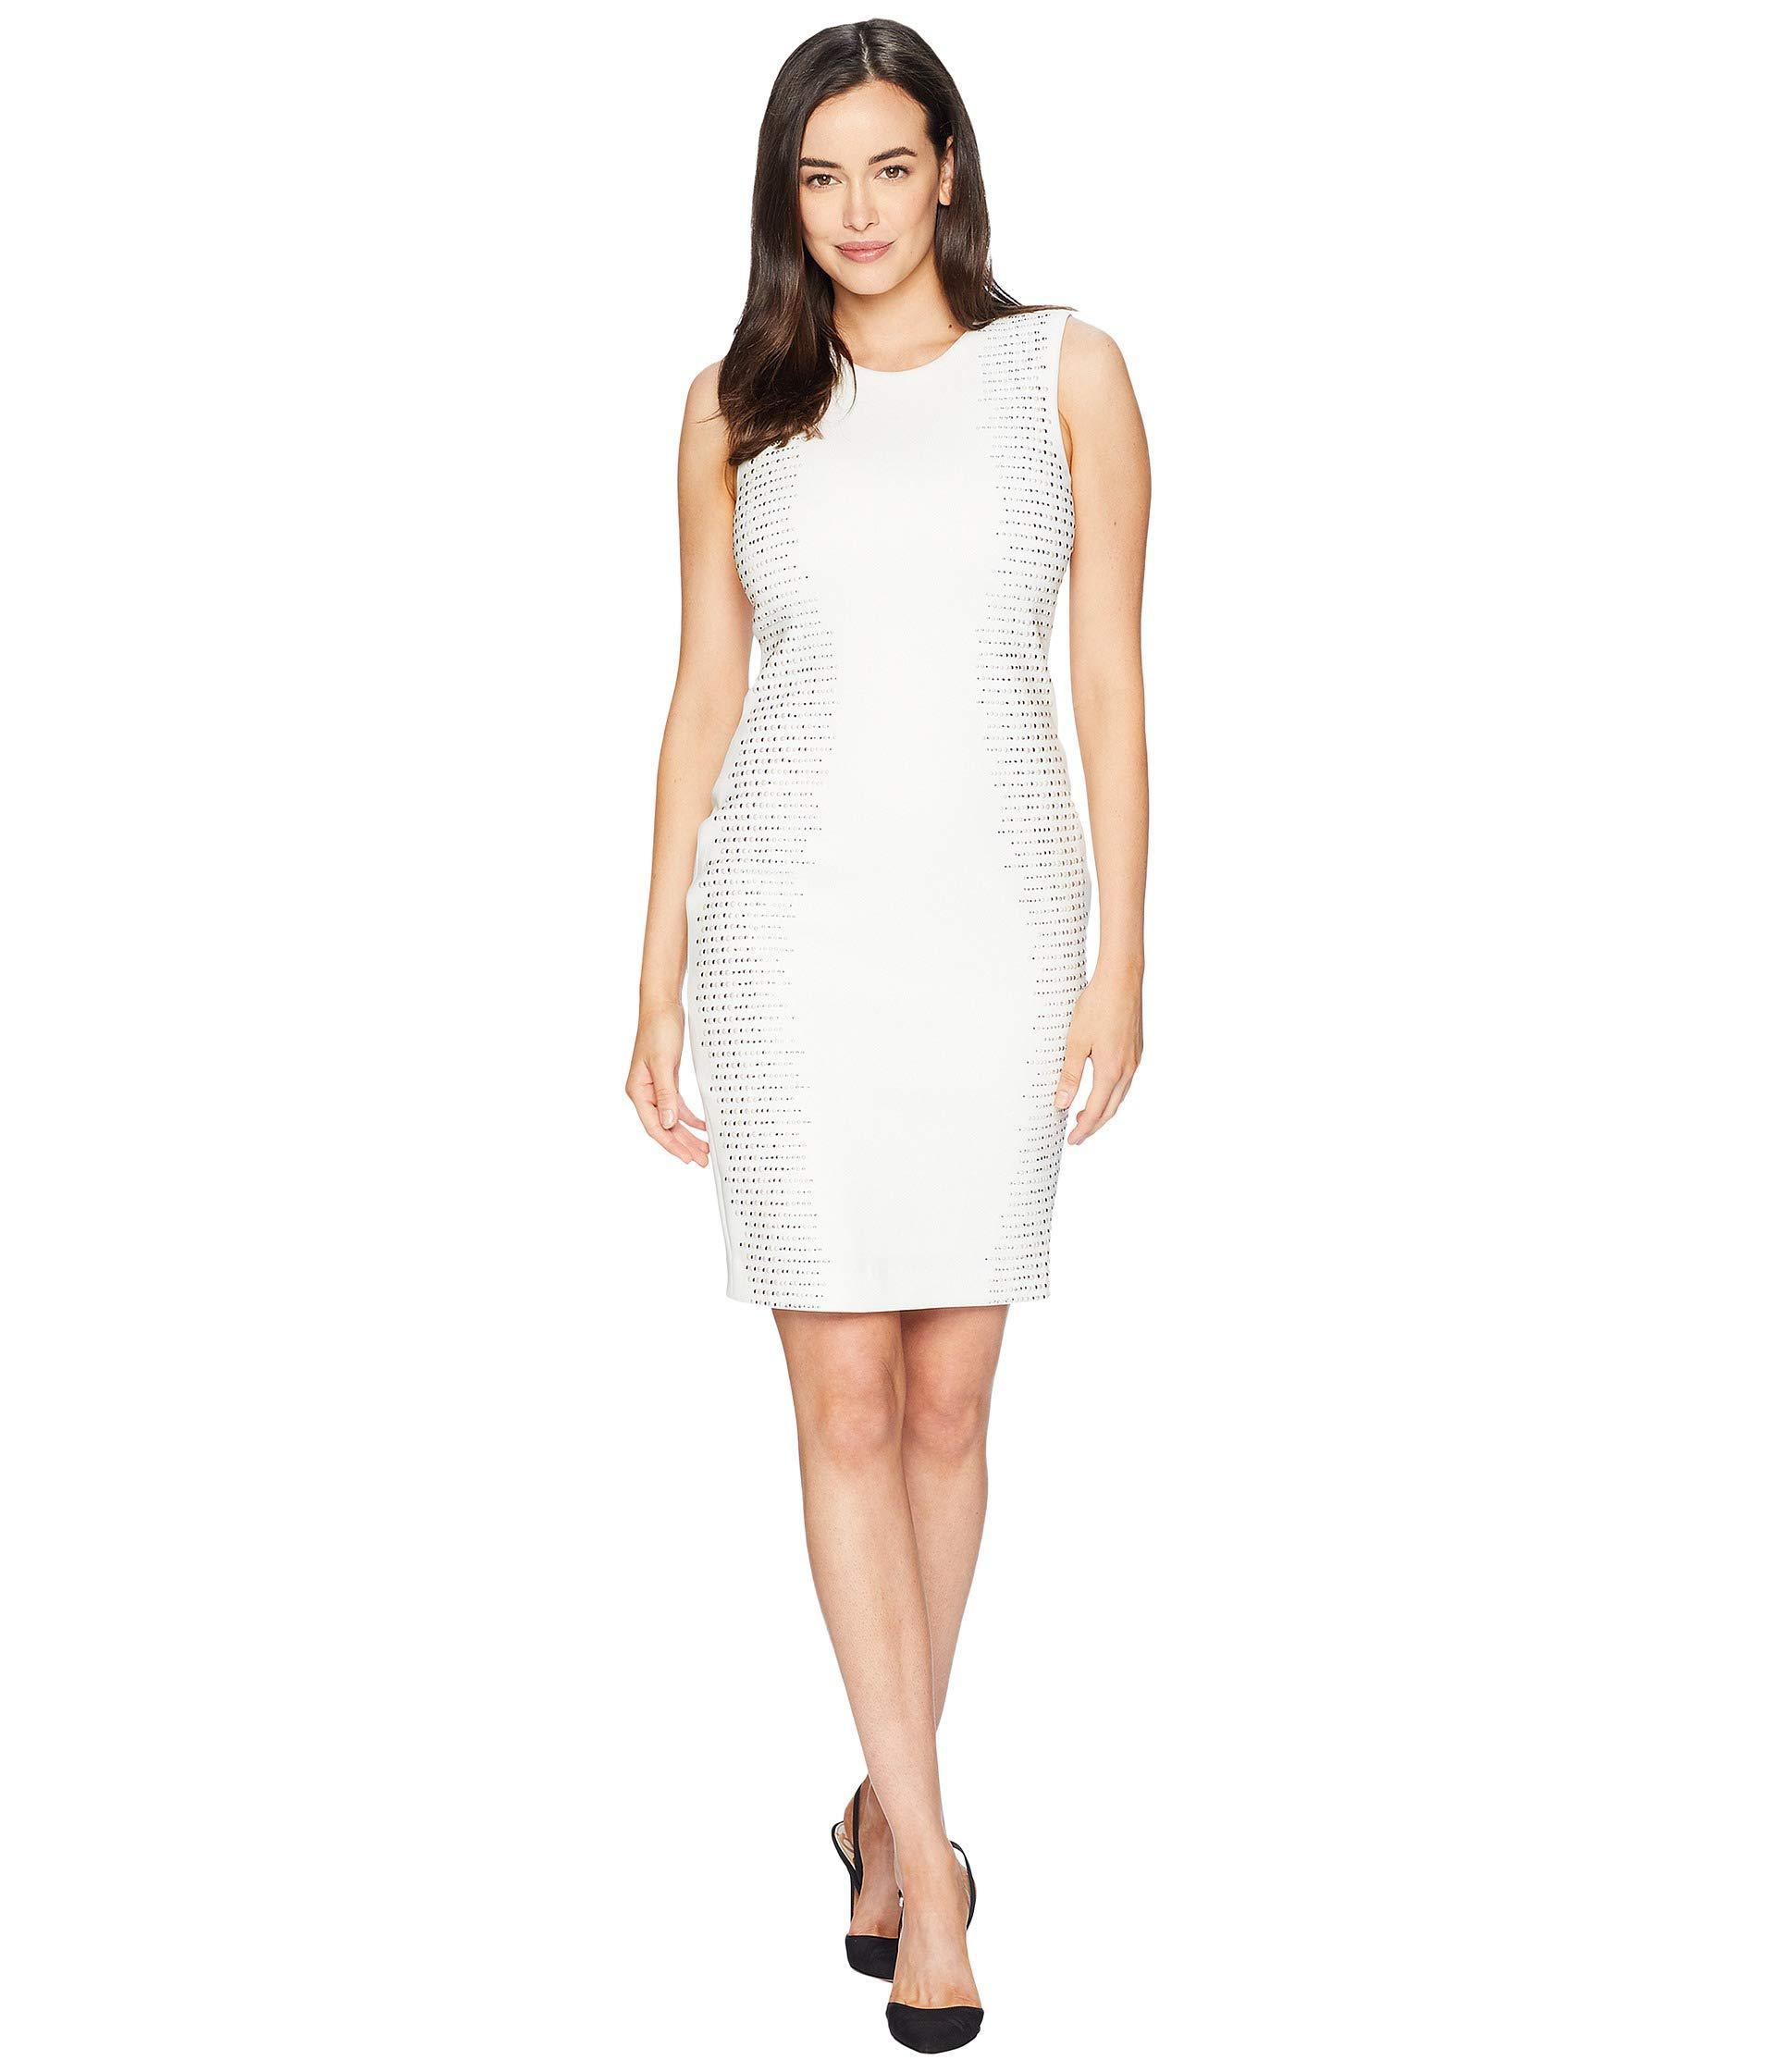 fe5ff9bf40d9 Calvin Klein Embellished Side Panels Sheath Dress Cd8m18tp in White ...